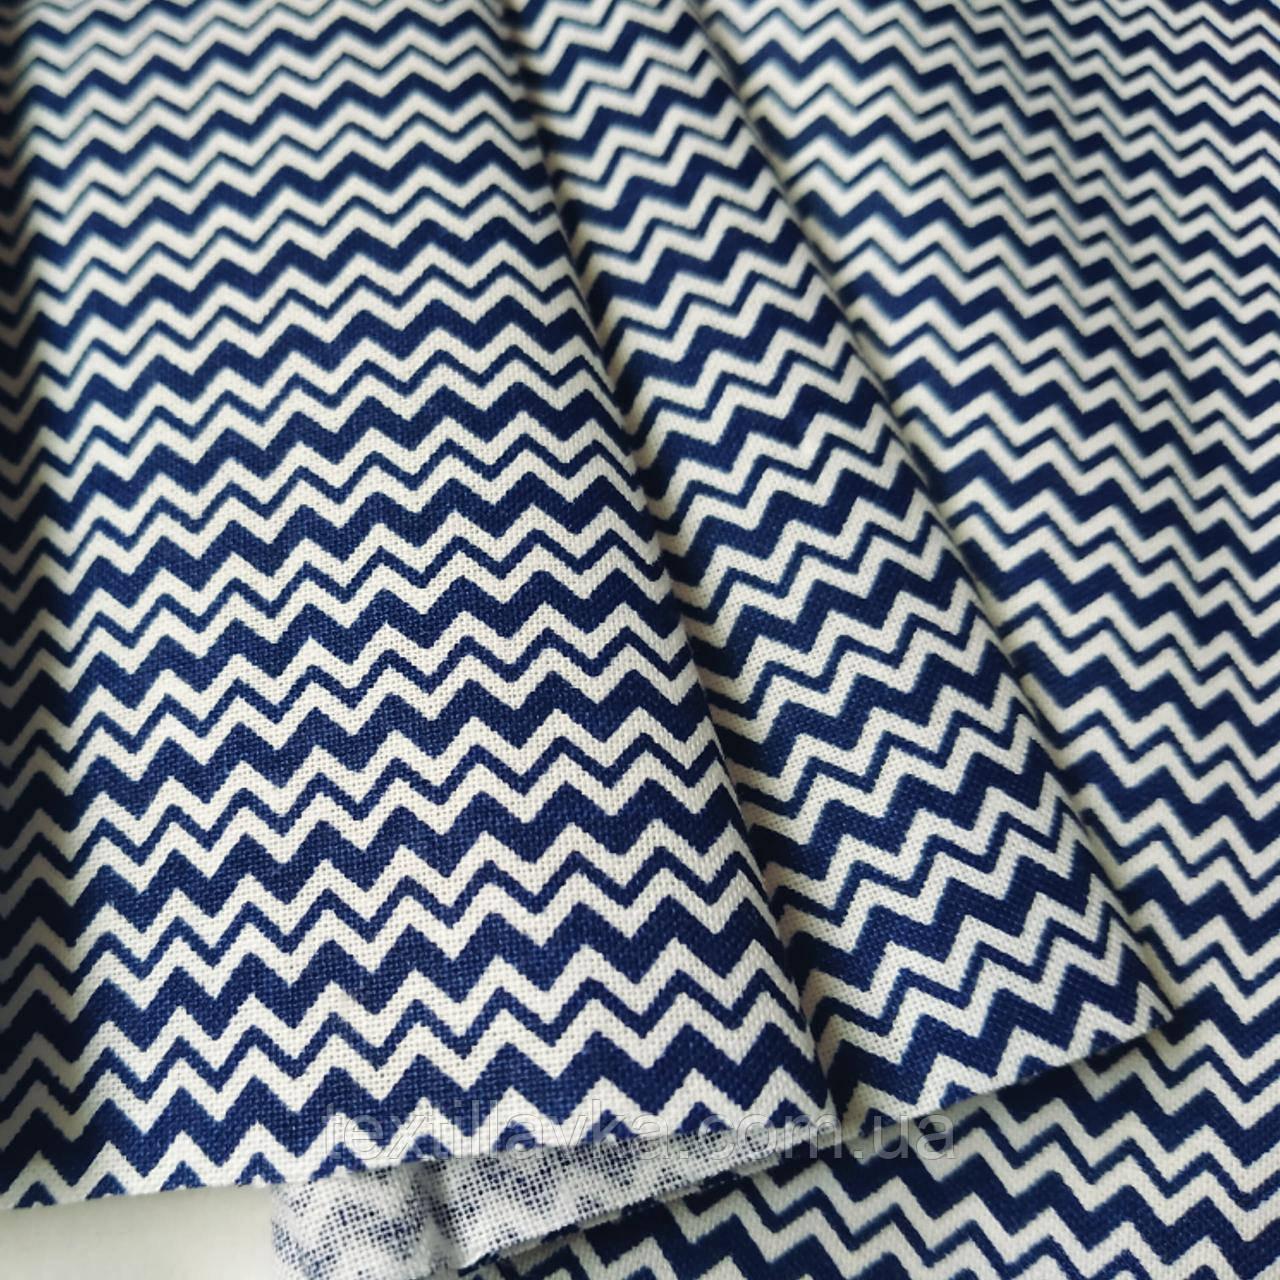 Ткань хлопок мелкий синий зигзаг